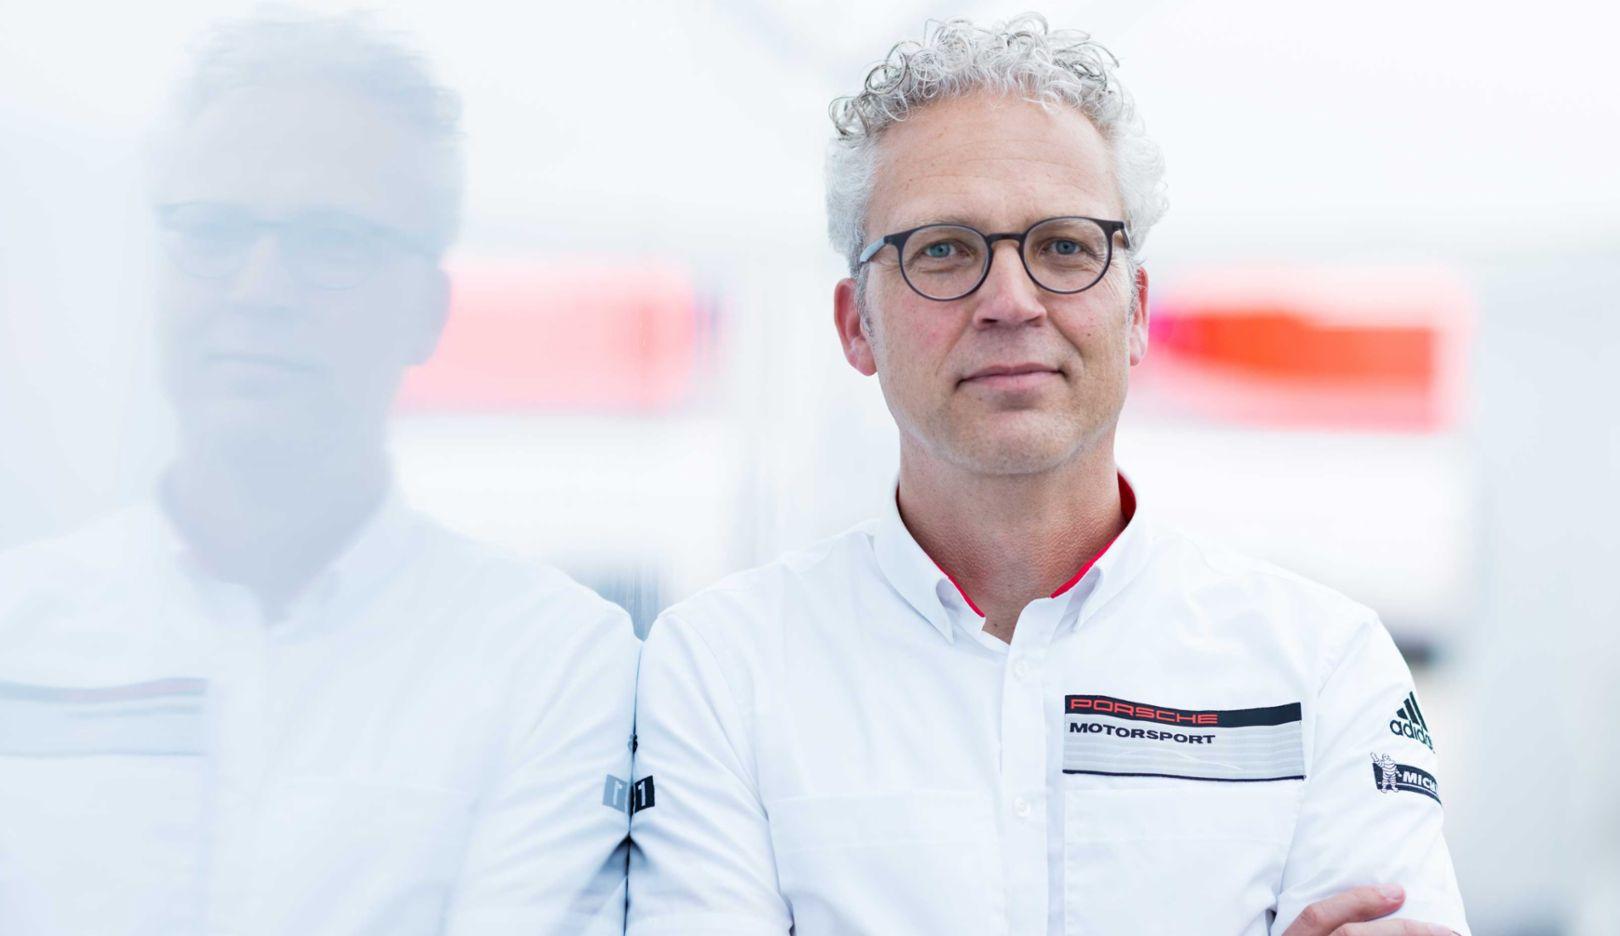 Daniel Armbruster, President and CEO of Porsche Motorsports North America, 2017, Porsche AG